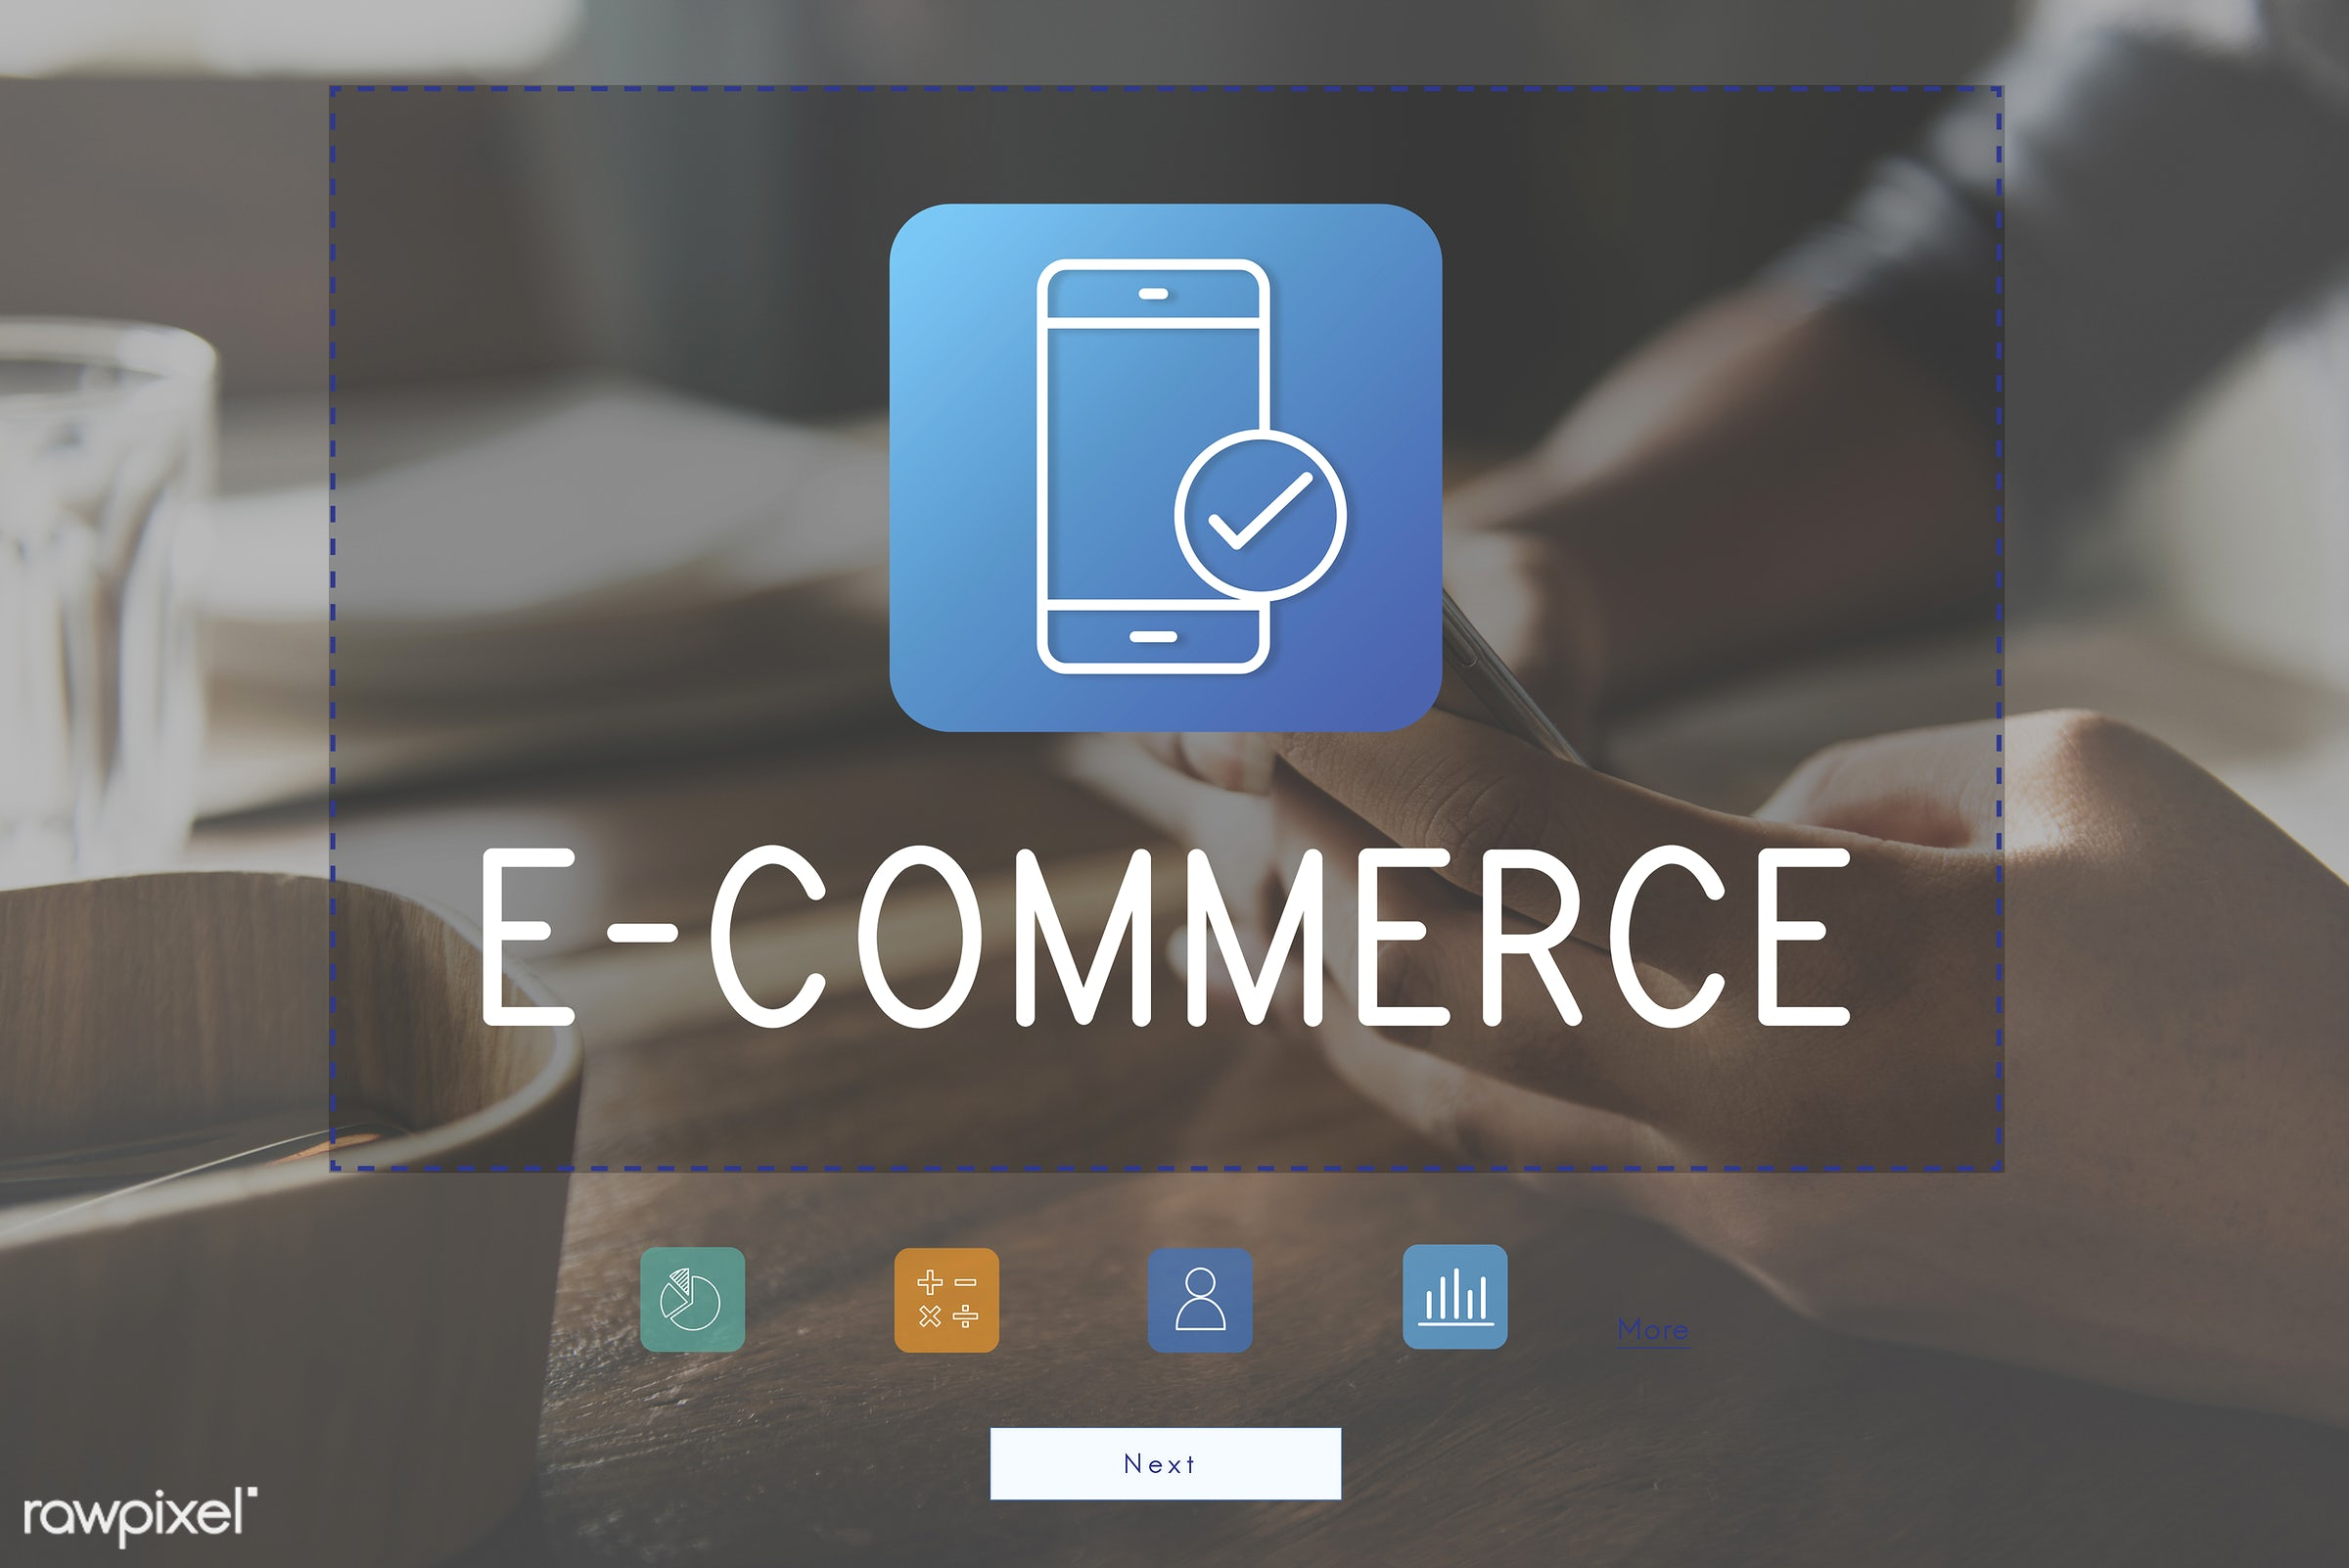 accounting, balance, banking, break, business, cellphone, control, data, database, device, digital, digital device, drink,...